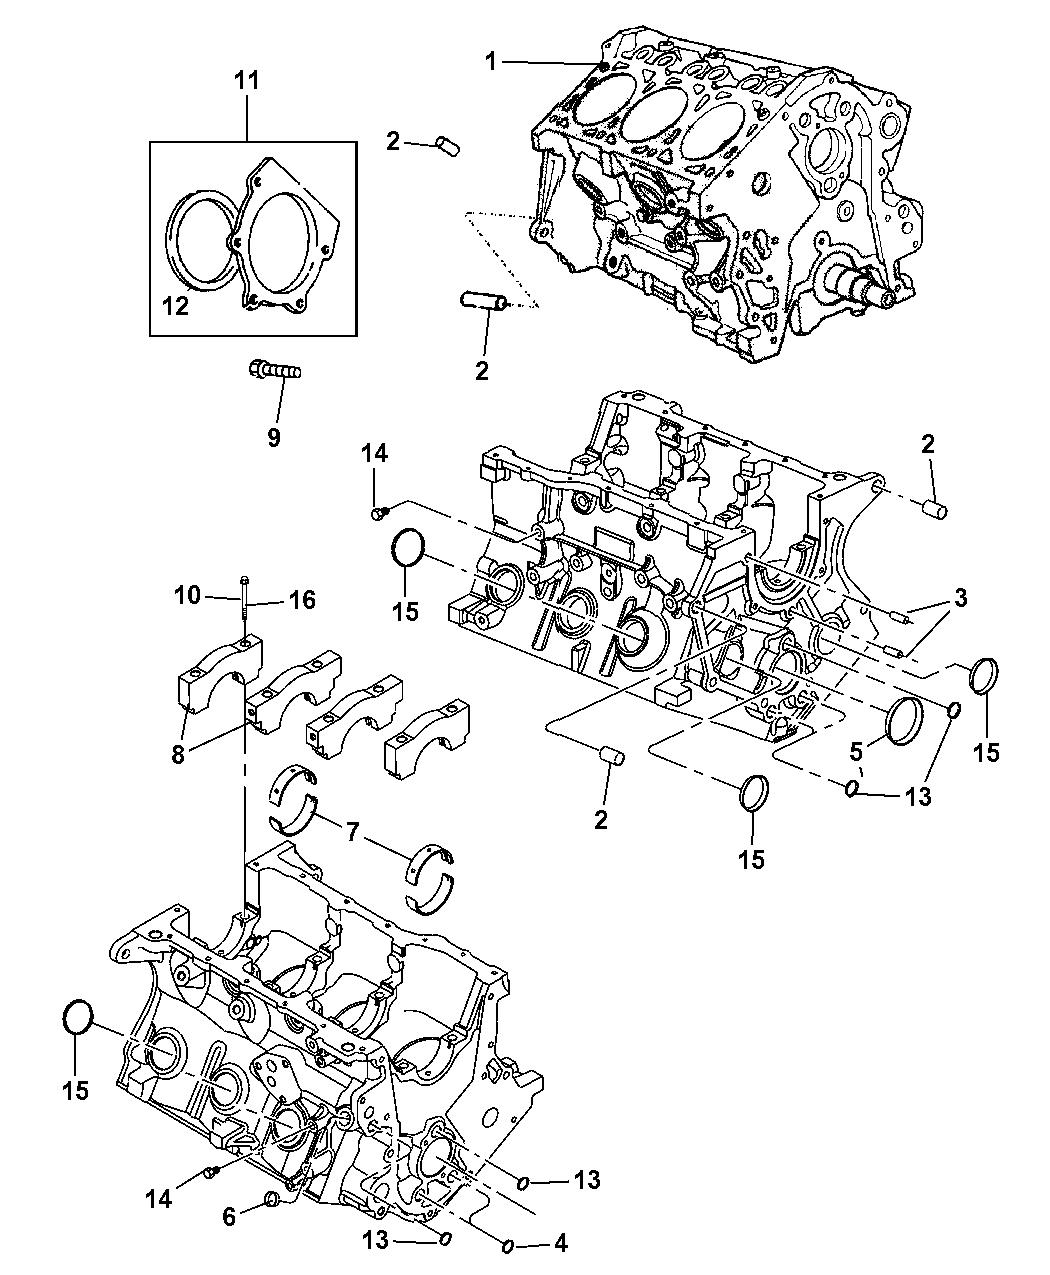 2010 Jeep Wrangler Engine Cylinder Block Hardware Yj Diagram Thumbnail 1